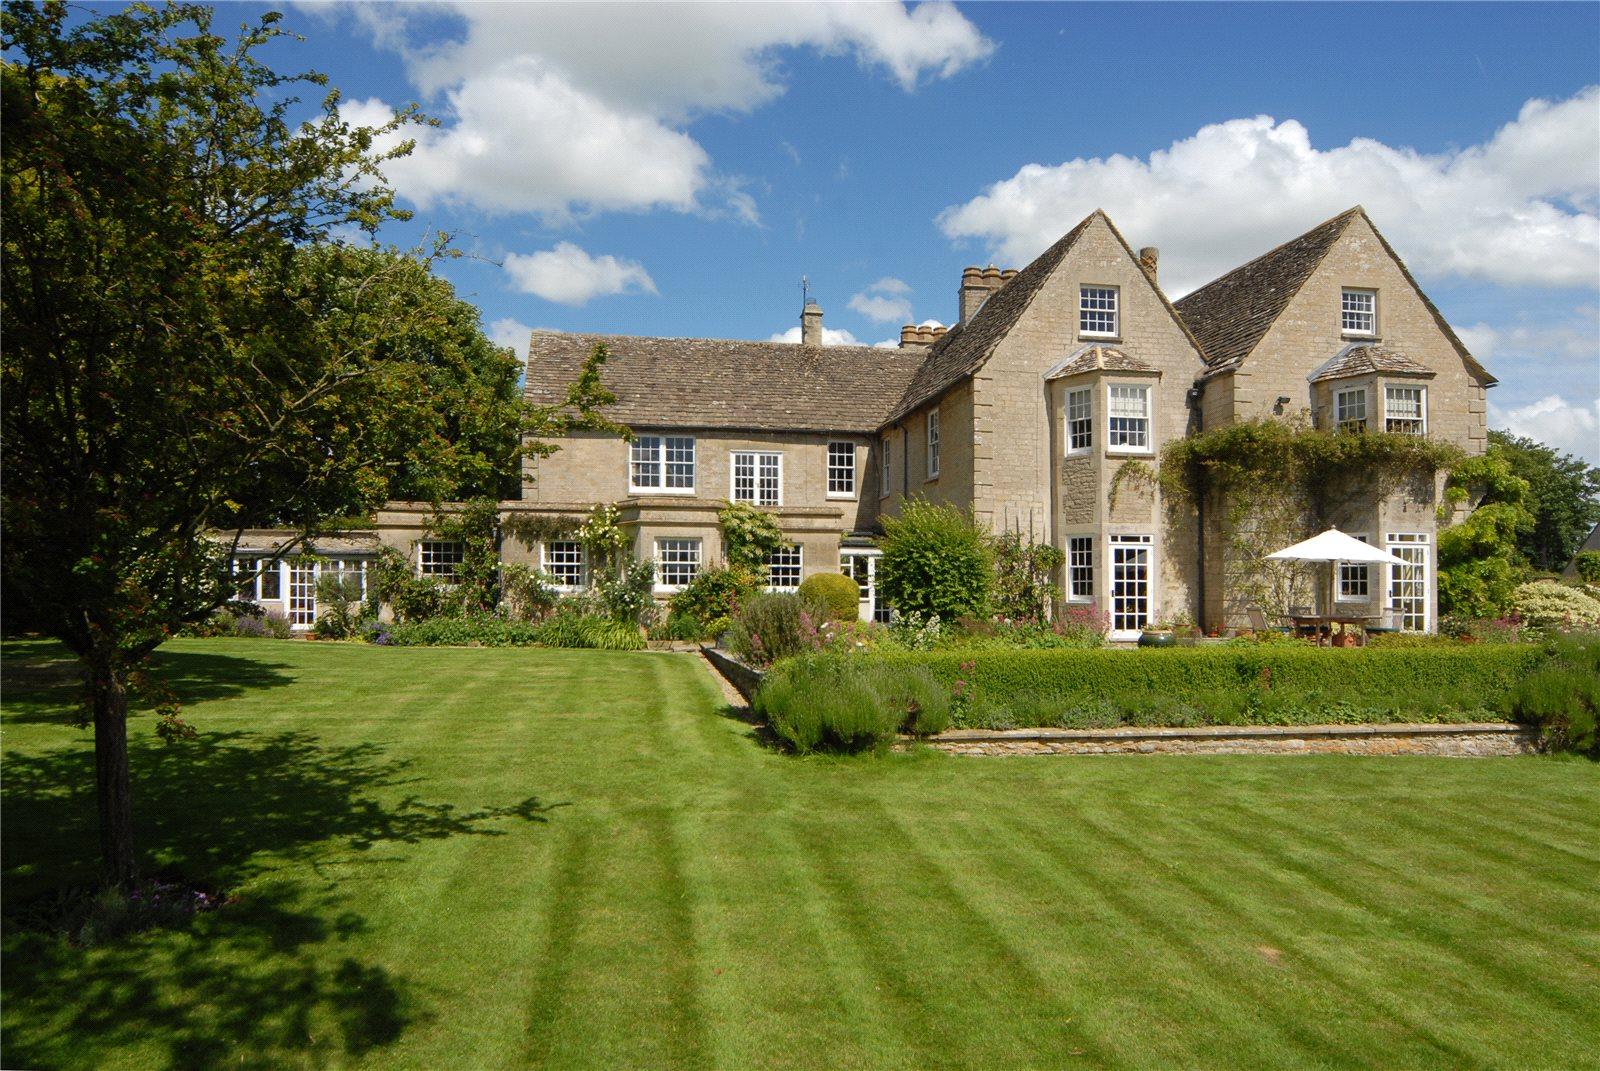 Casa para uma família para Venda às High Street, Kempsford, Fairford, Gloucestershire, GL7 Wales